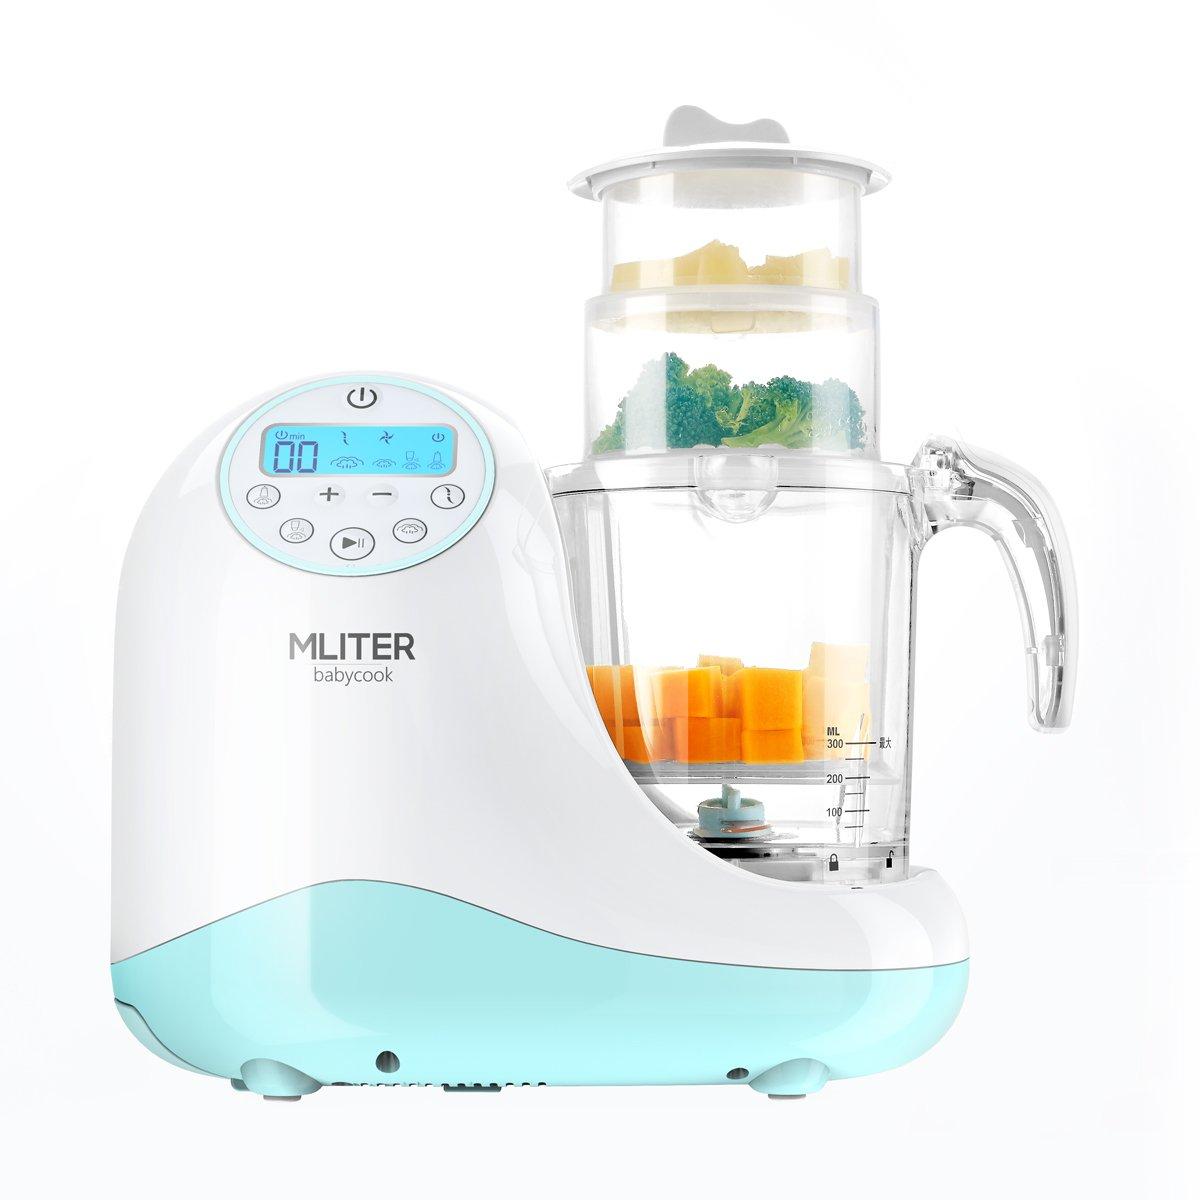 OKSLO All in one baby food maker with steam cooker, blender, chopper, sterilizer & war